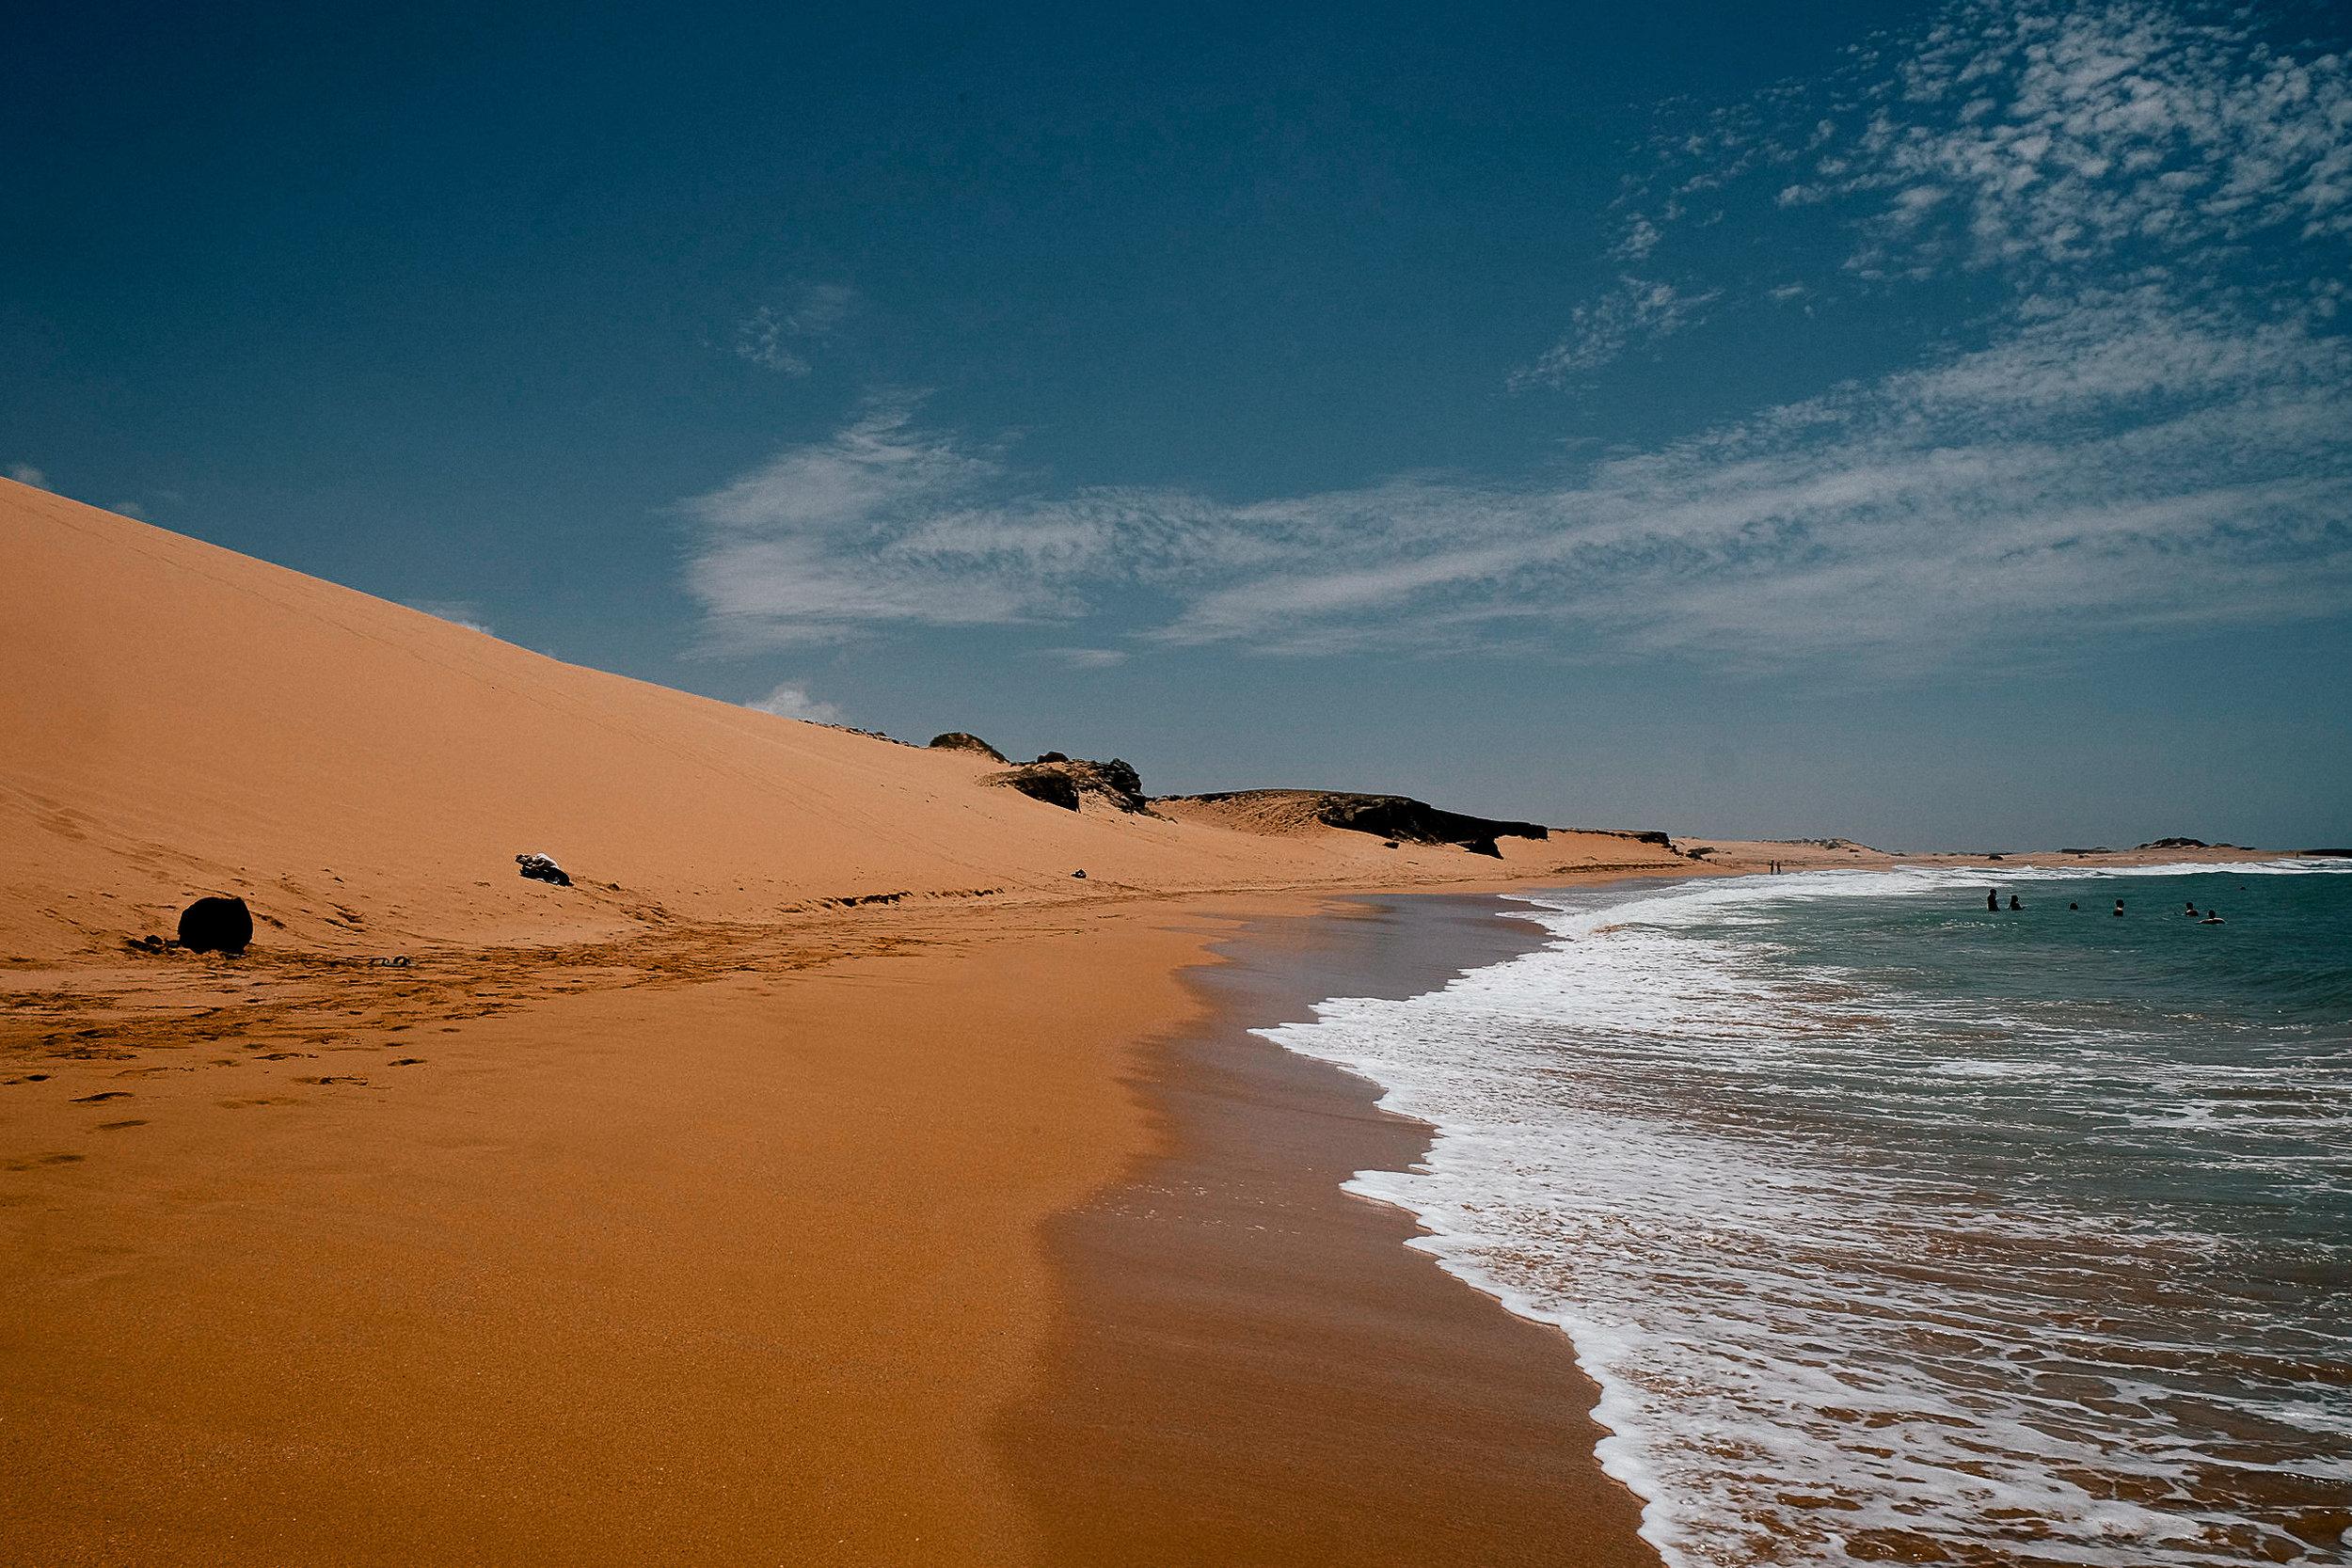 The beach beyond the dunes.